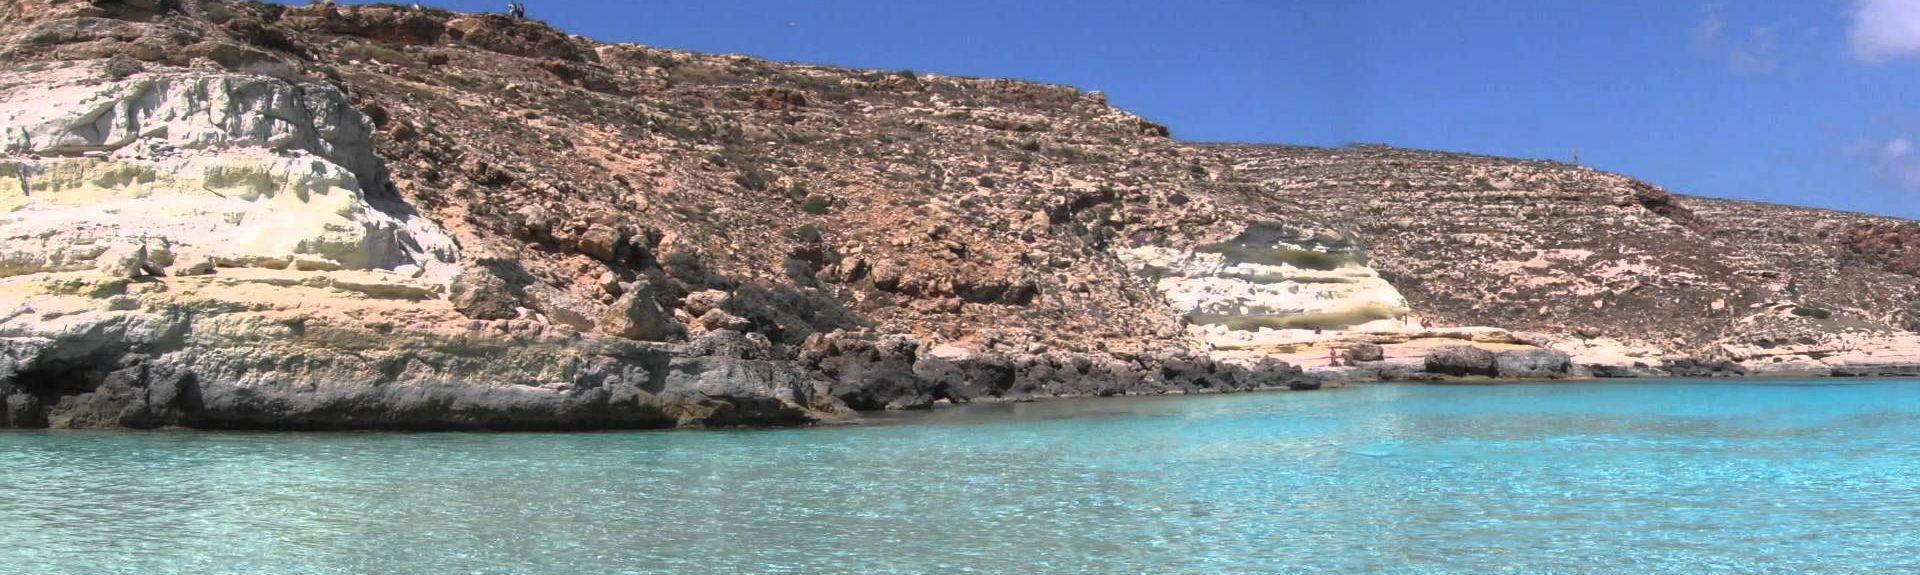 Lampedusa Airport (LMP), Lampedusa, Italy